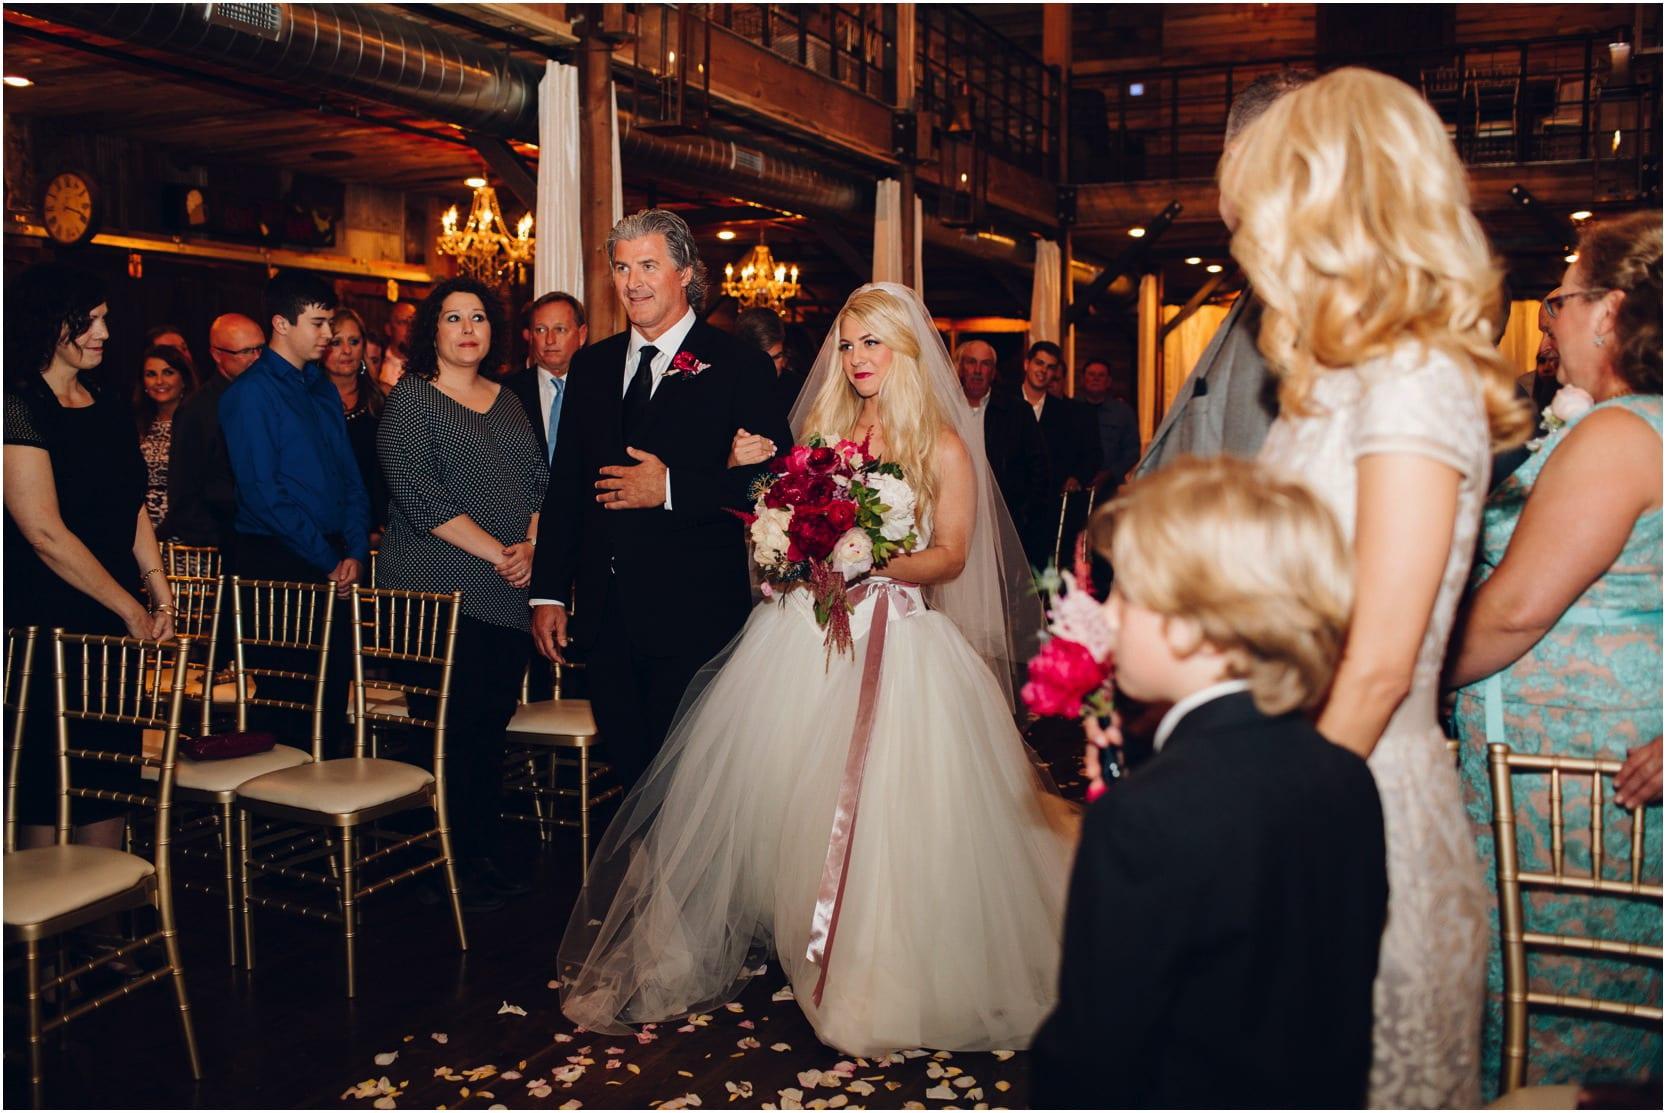 coderhillengburg_oklahoma_wedding__606_blogstomped